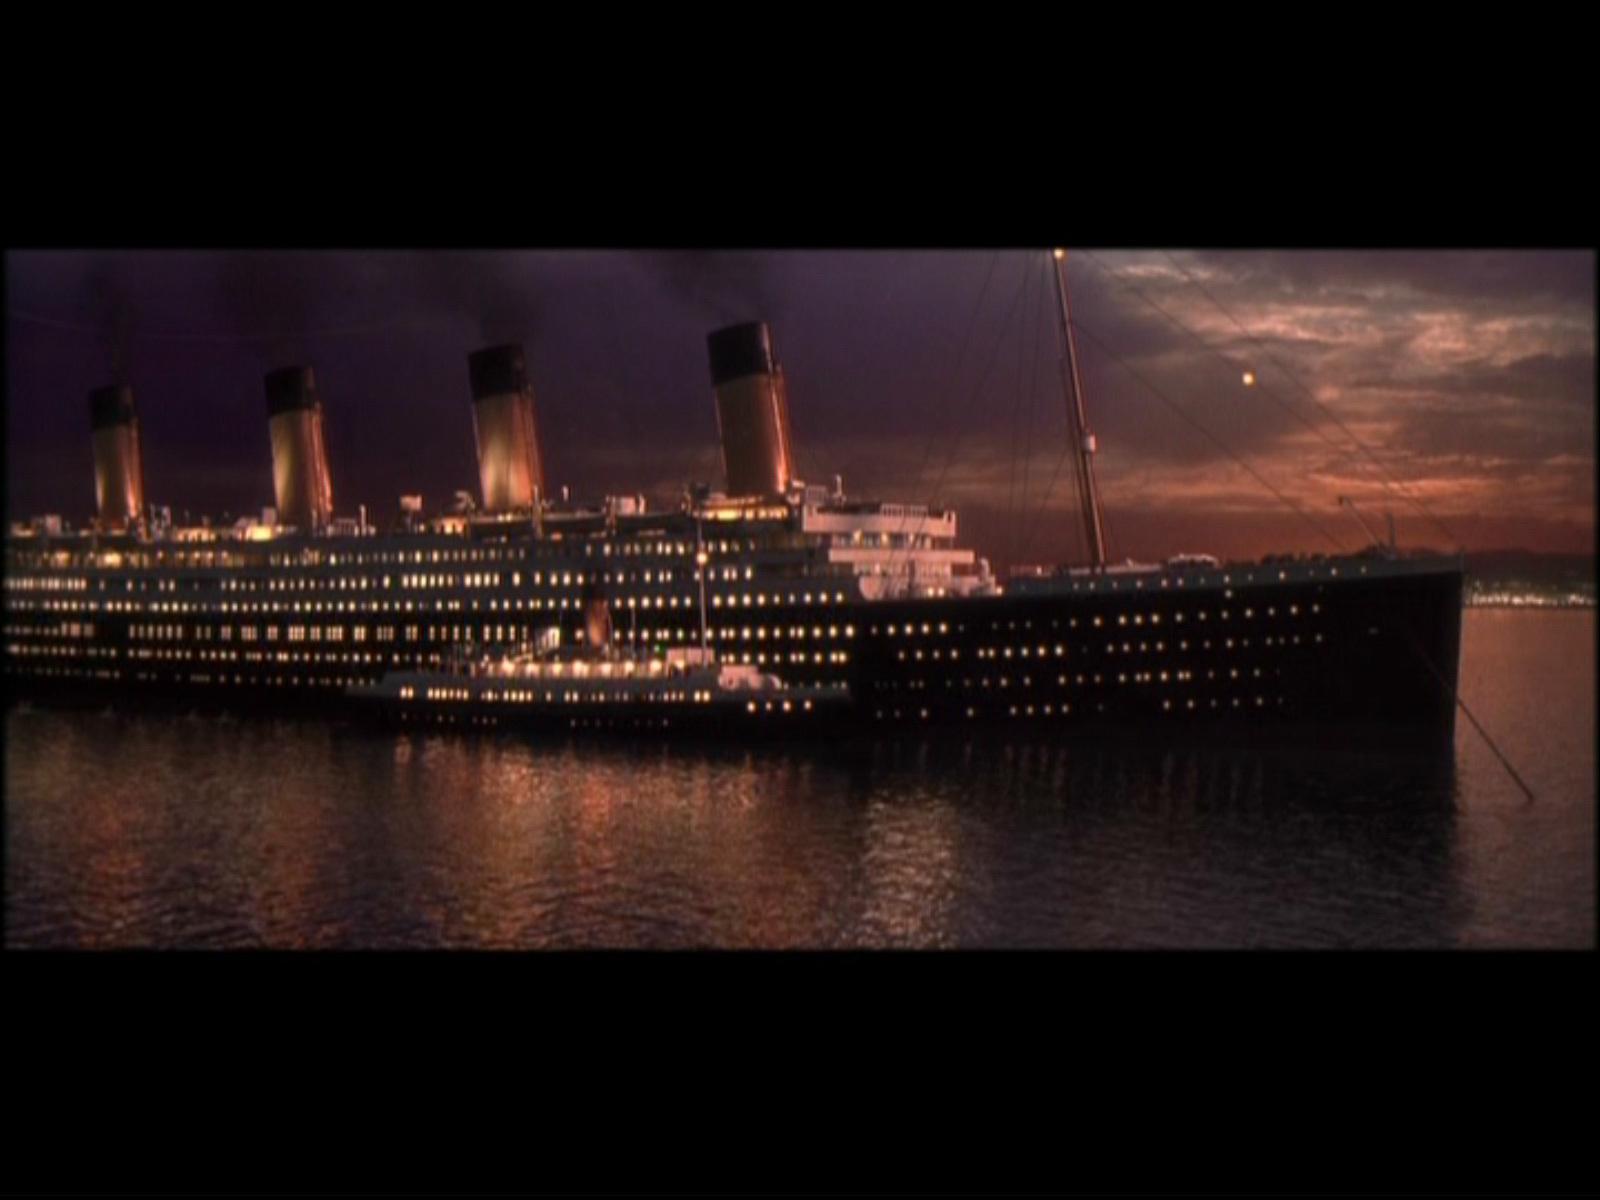 Feature Wall Wallpaper 3d Titanic Screencaps Titanic Image 4799149 Fanpop